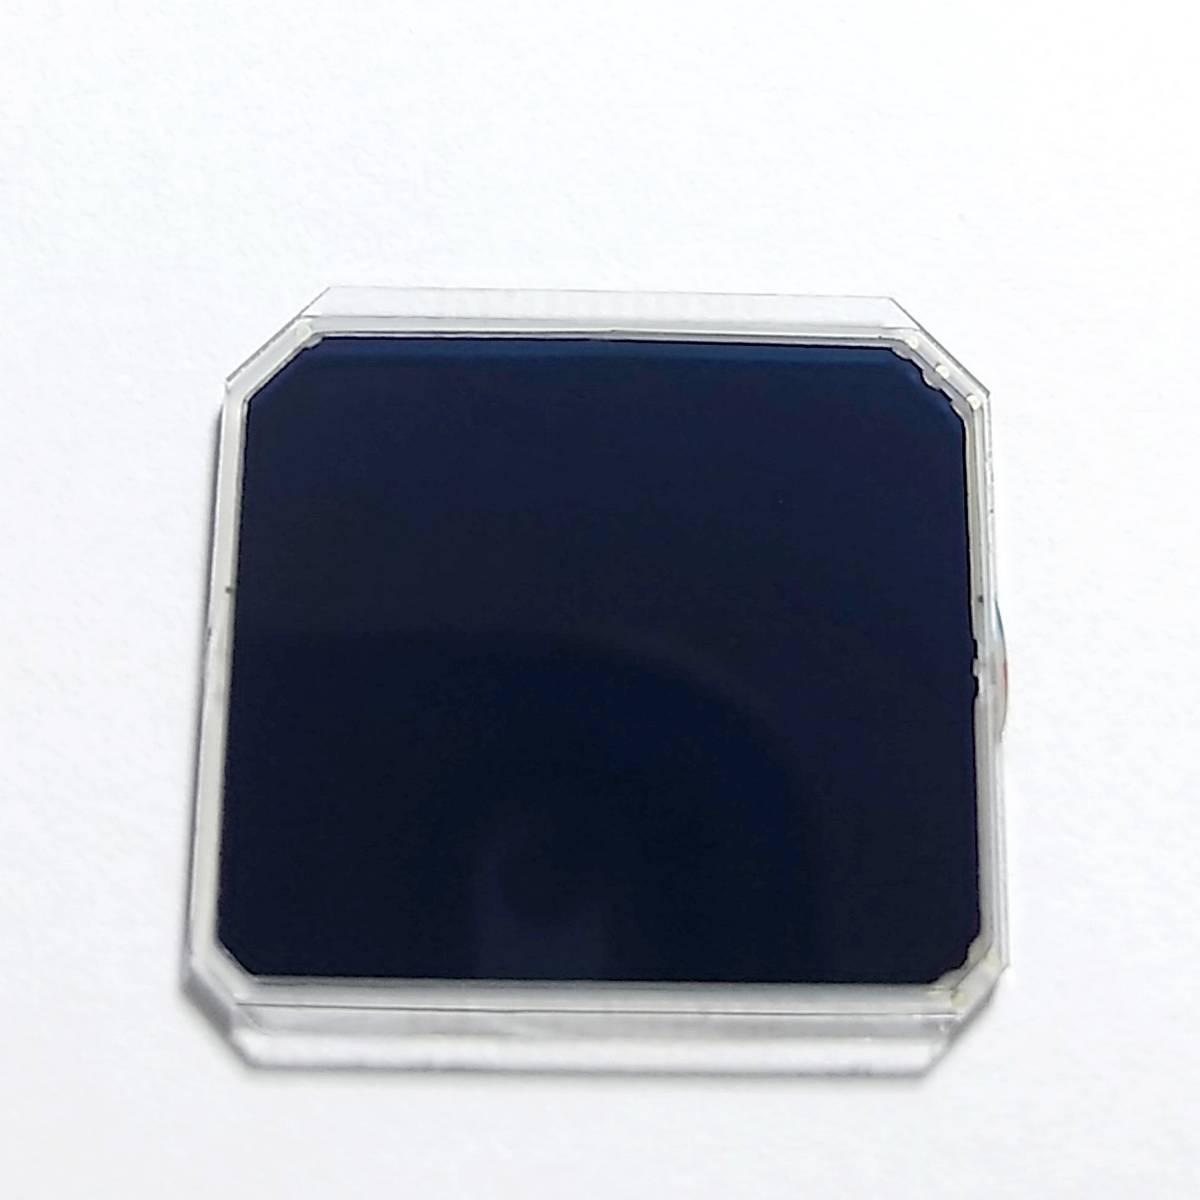 LCD Relogio Casio G-shock DW-5600BB-1,   QW-3229AT-07TKDW-5600DC-1DW-5600SL-7DW-5600SL-1DW-5600PM-1  - E-Presentes